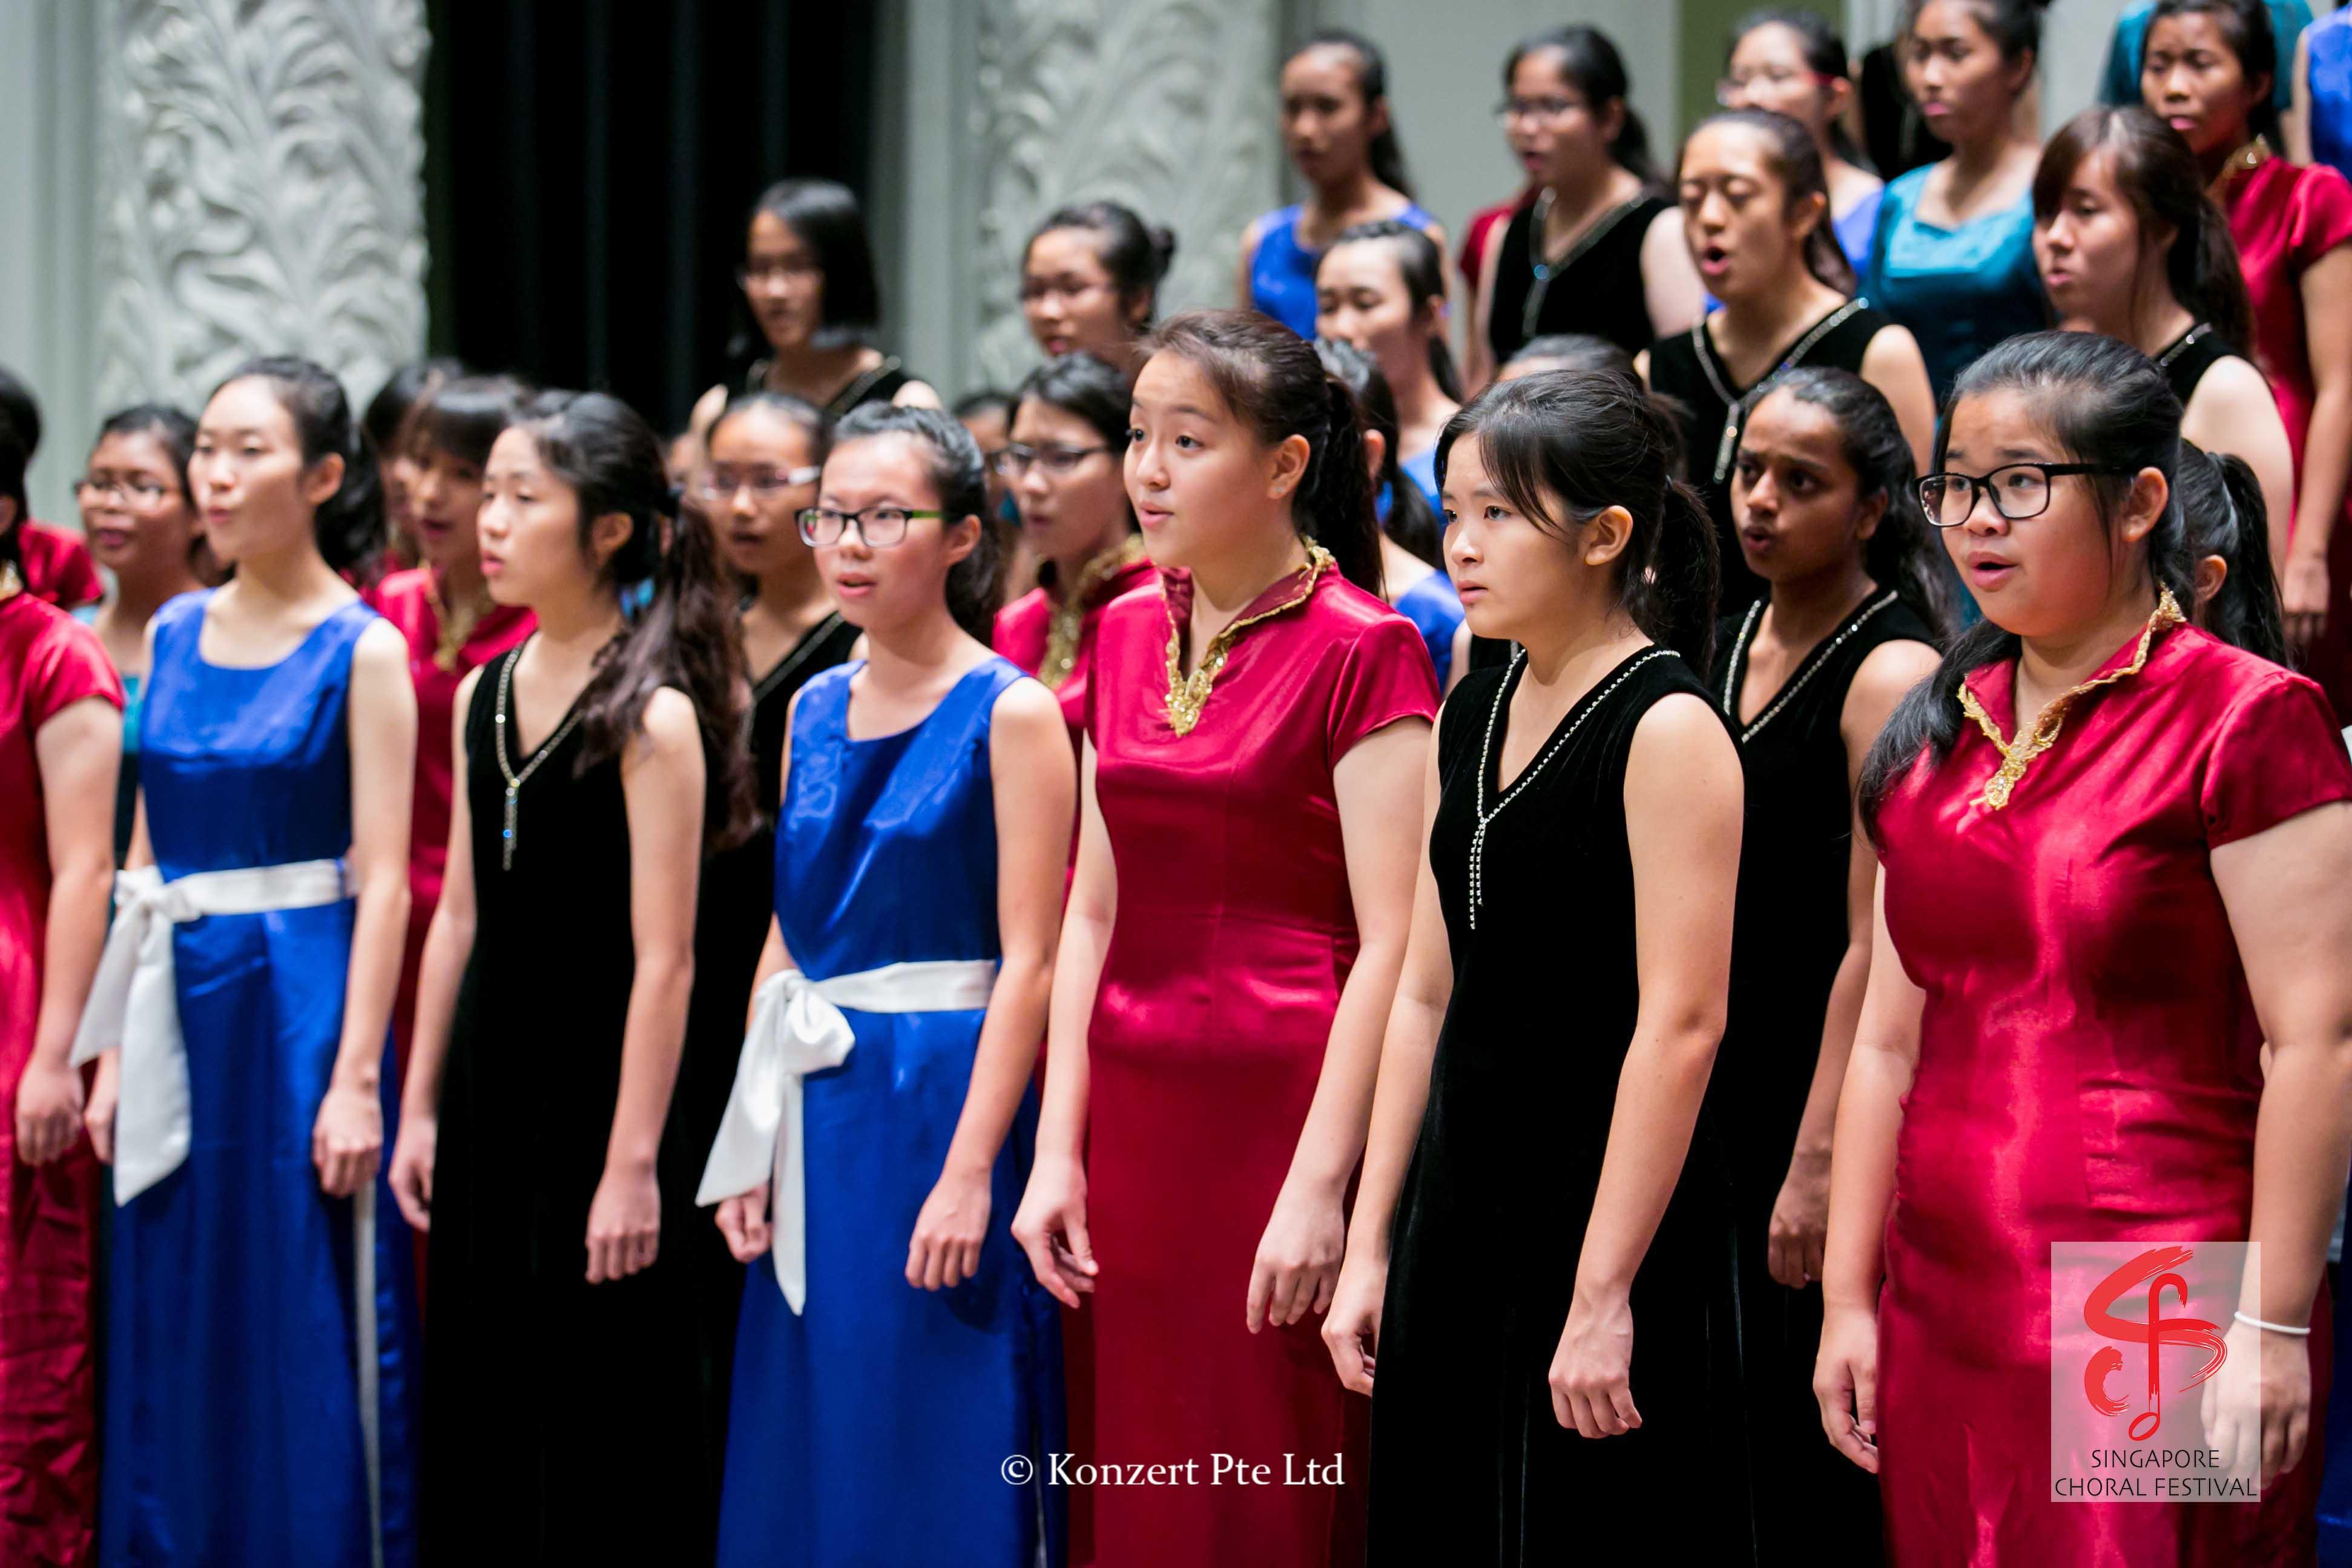 Singapore Choral Festival 7-8-15 (149).jpg